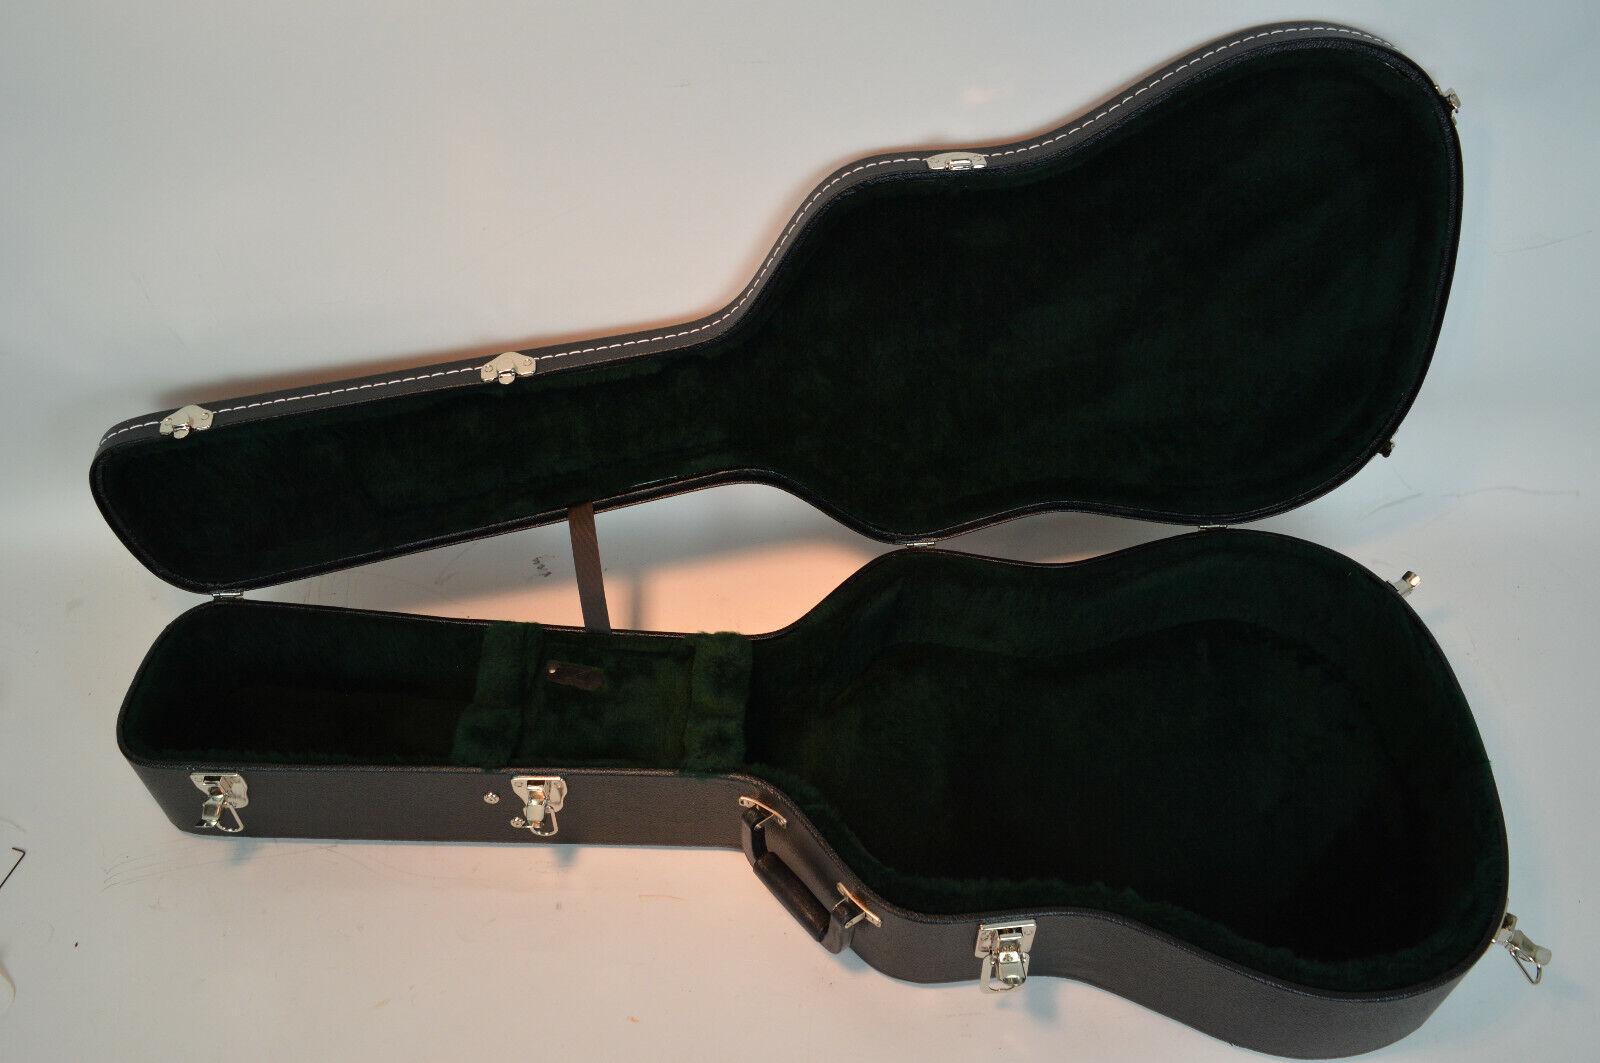 Guild Dreadnought D Größe Orpheum 6 or 12 String Acoustic Guitar Hard Shell Case